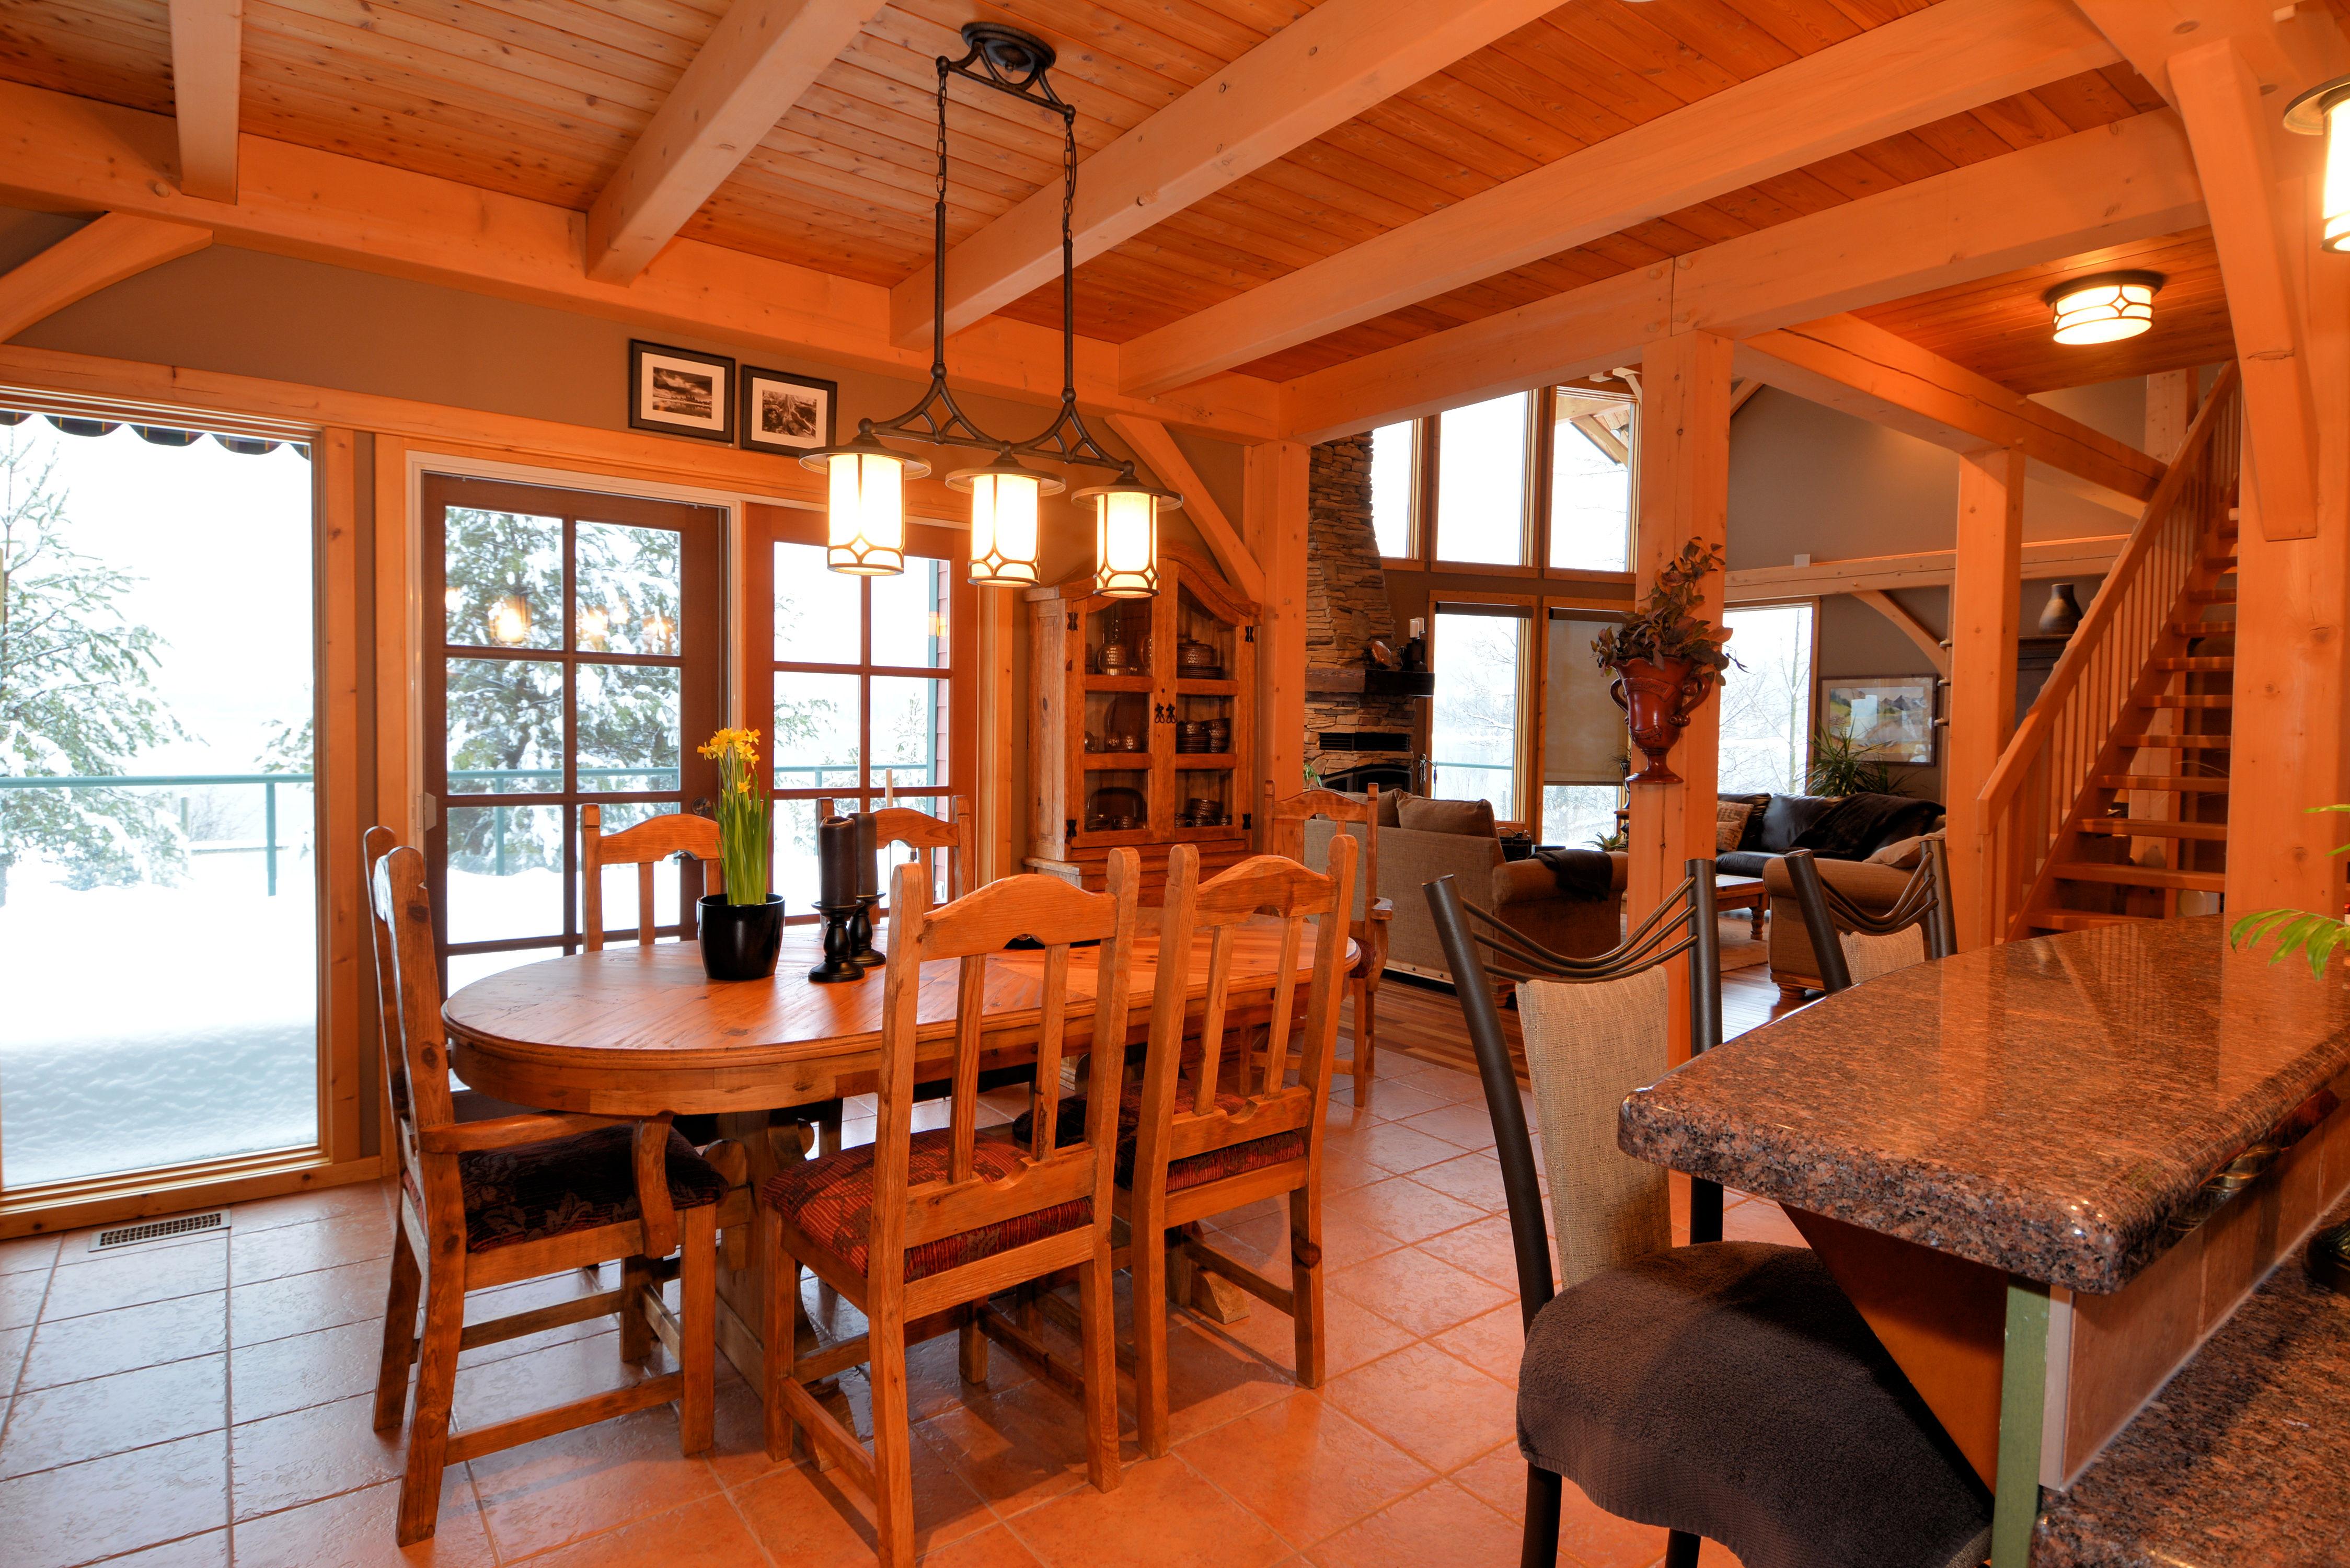 Dining Room: 14'6 x 11'